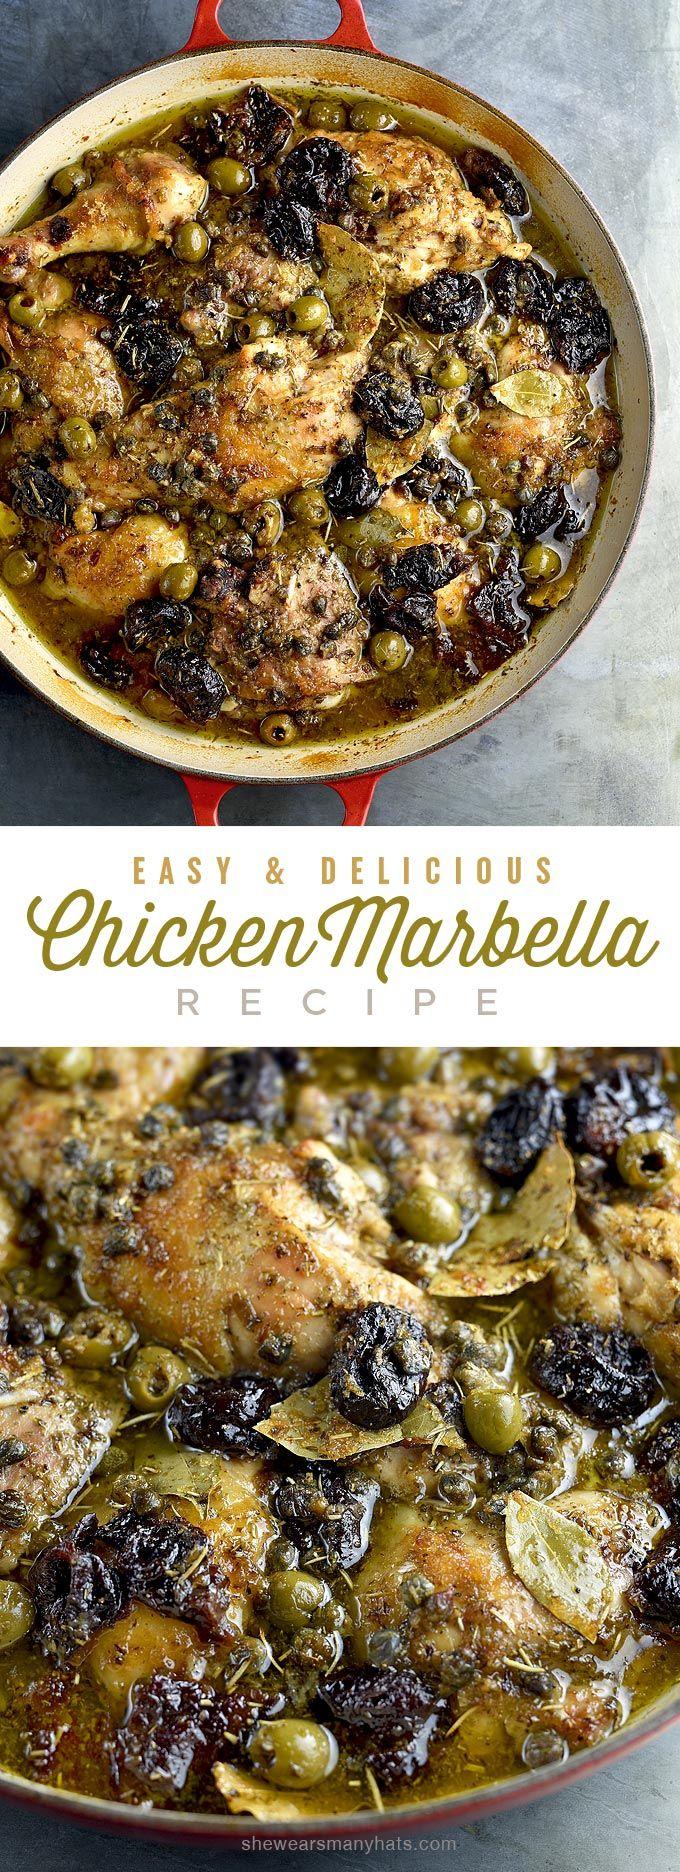 Chicken Marbella Recipe   shewearsmanyhats.com